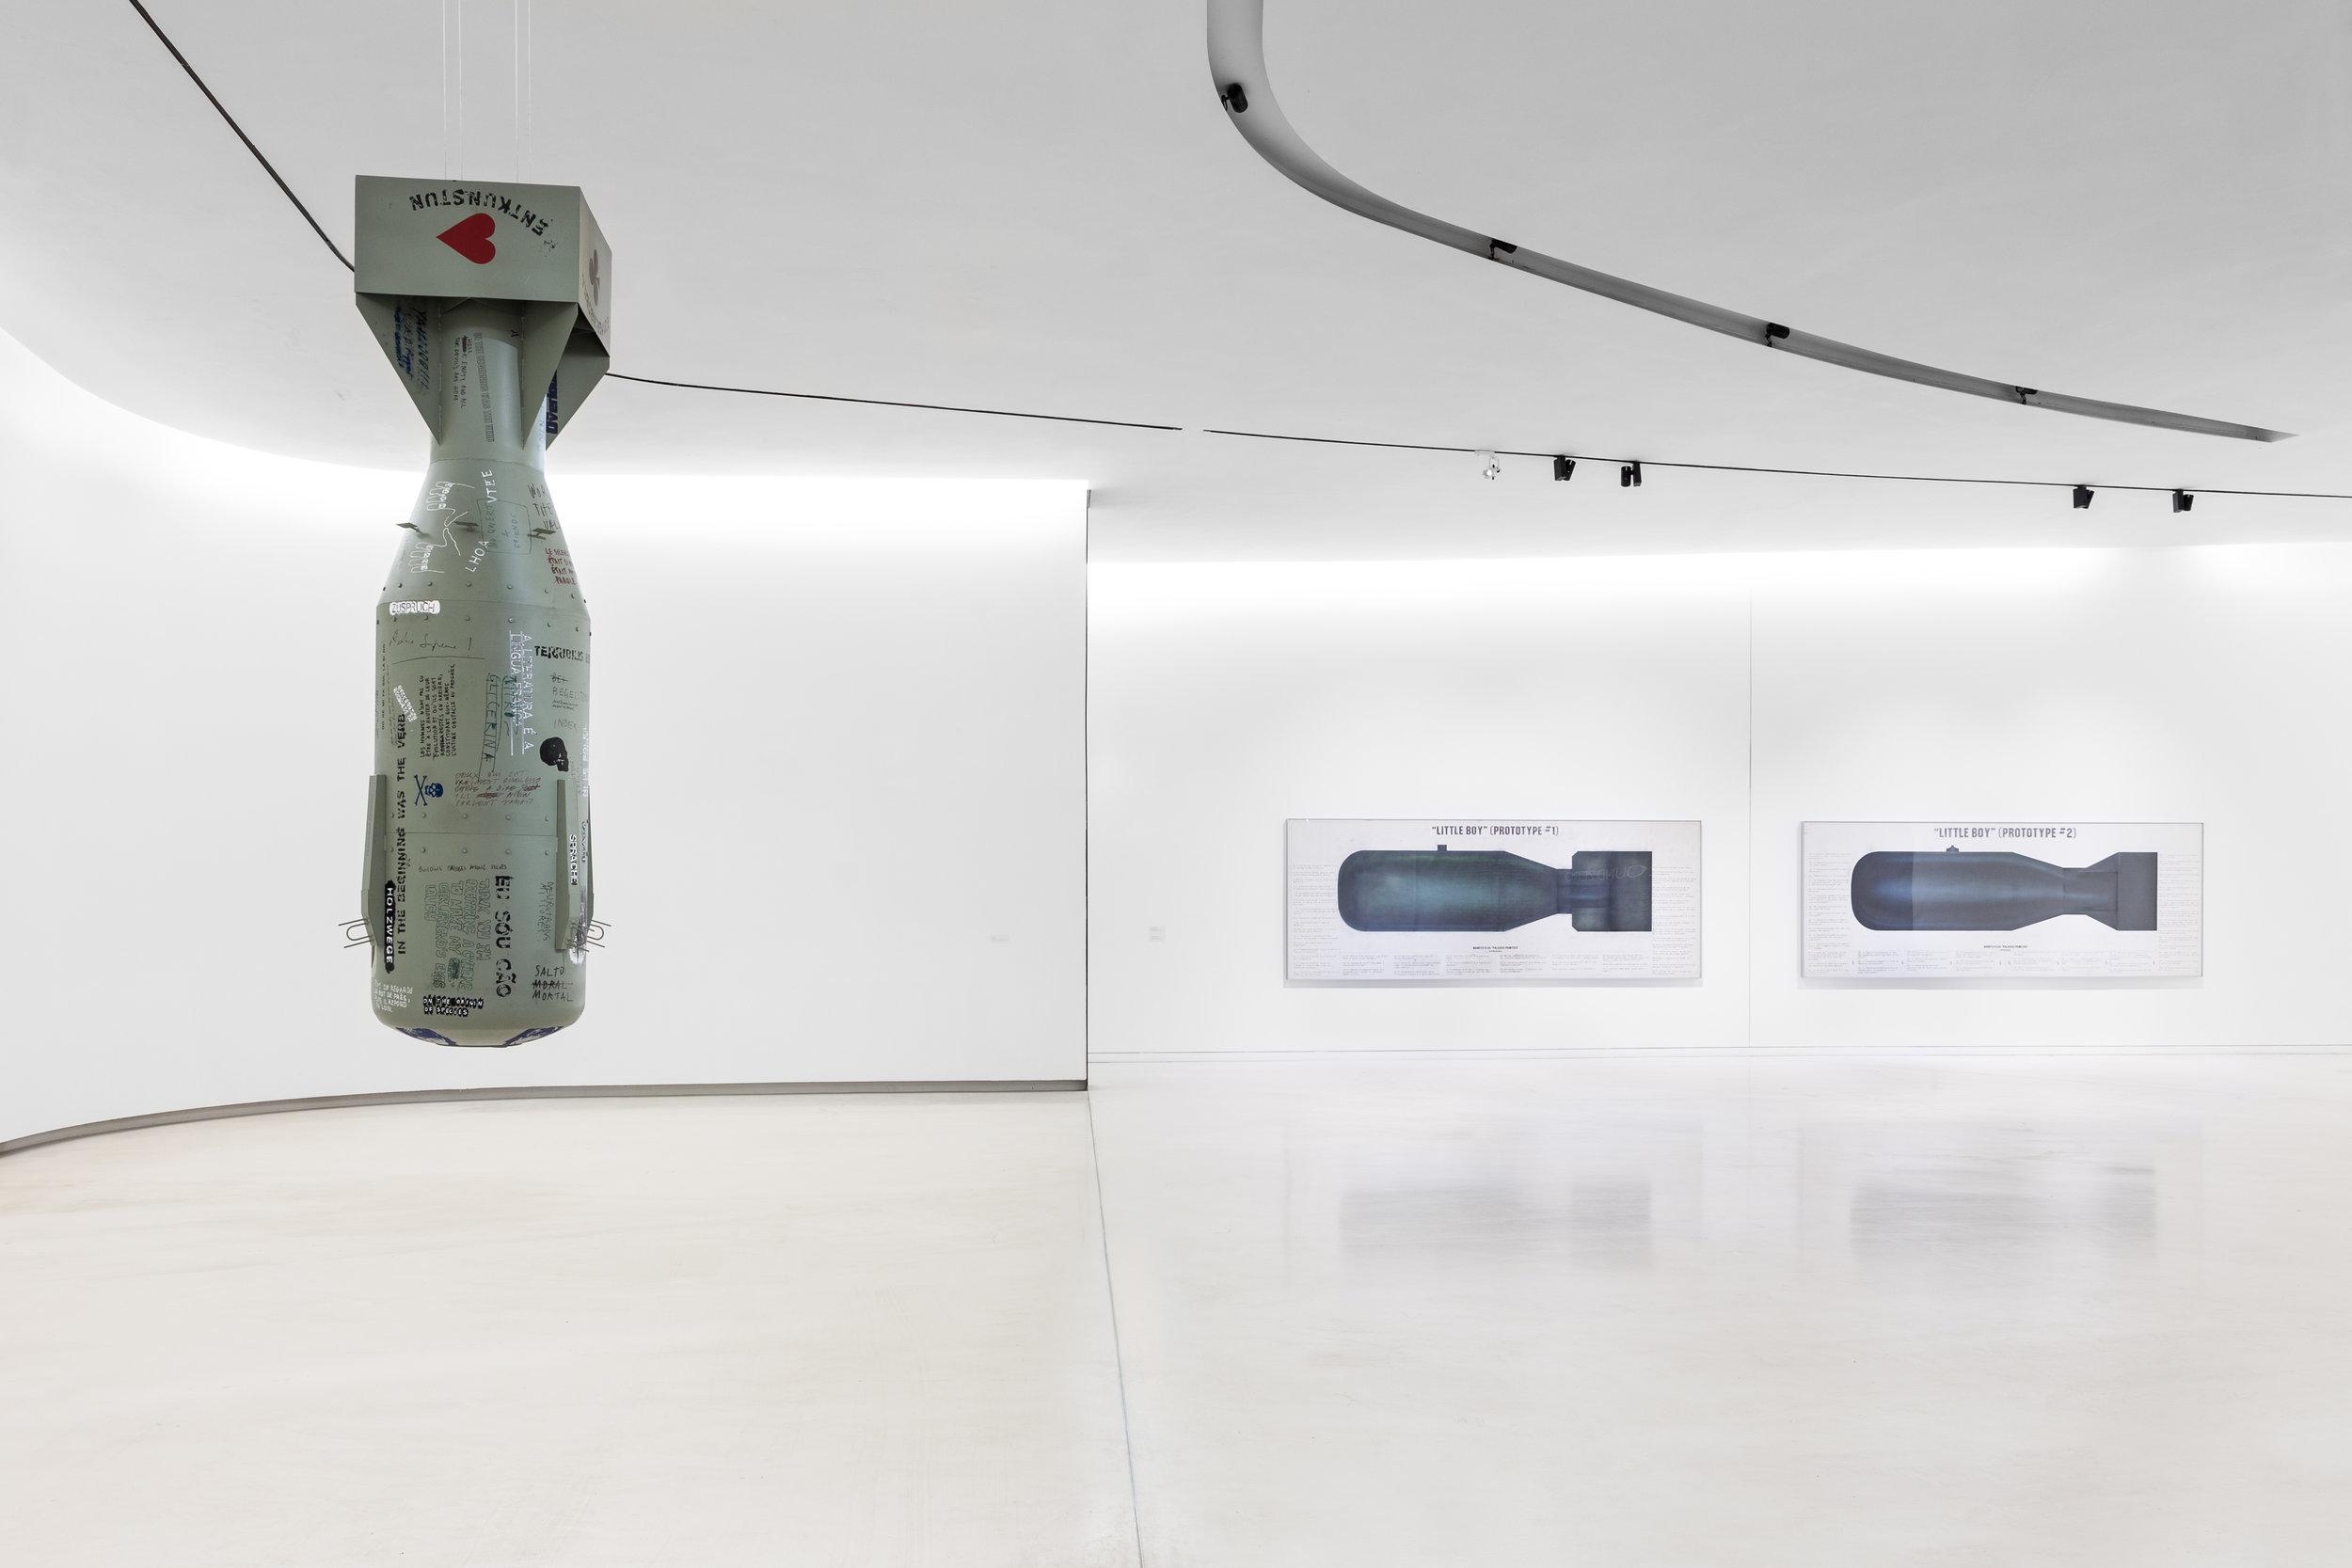 João Louro,  Linguistic Ground Zero,  2018 Installation view, MAAT, Lisbon, 2018. Photo: Bruno Lopez